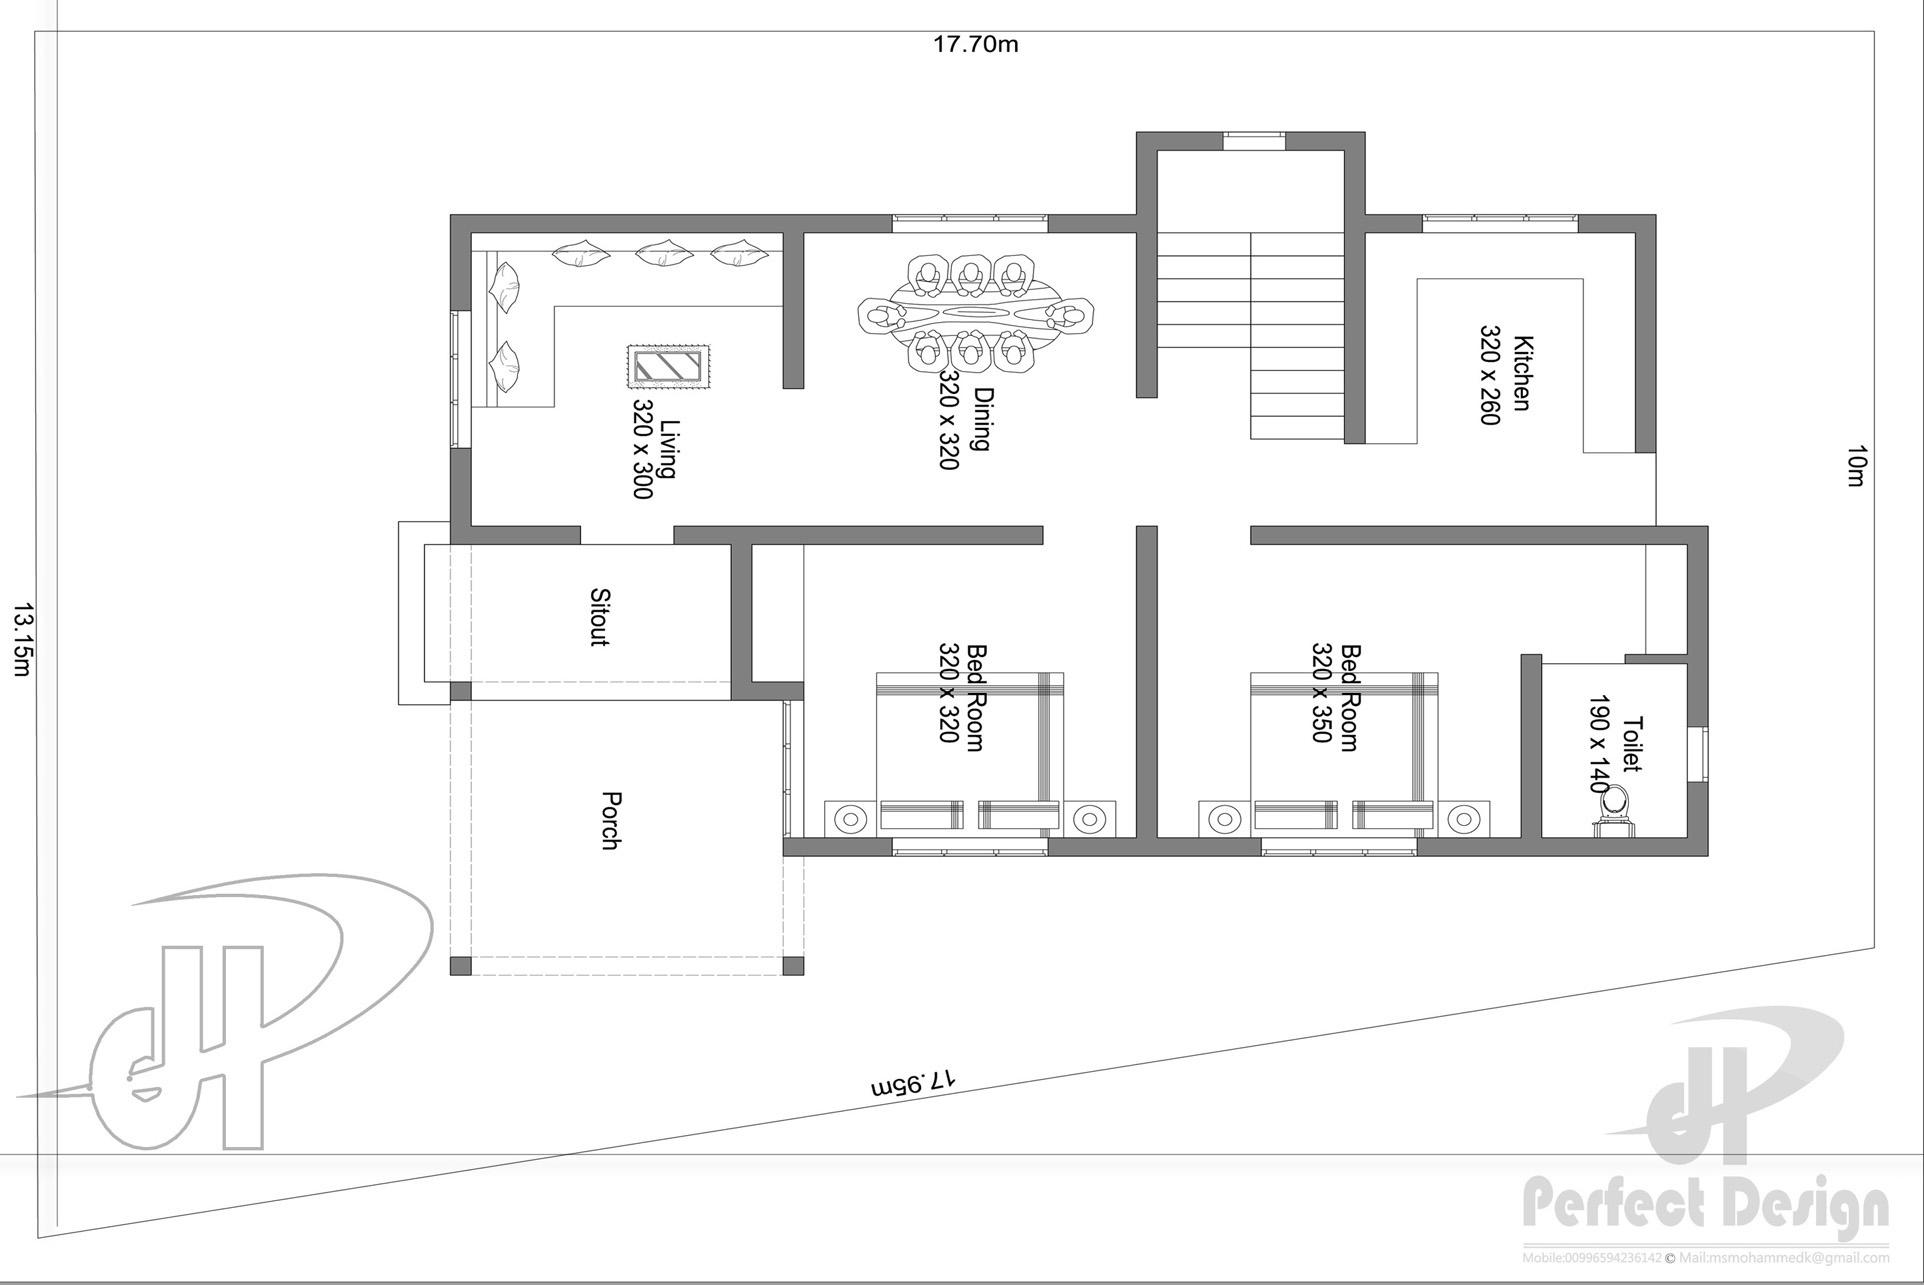 862 sq ft single floor home kerala home design plan